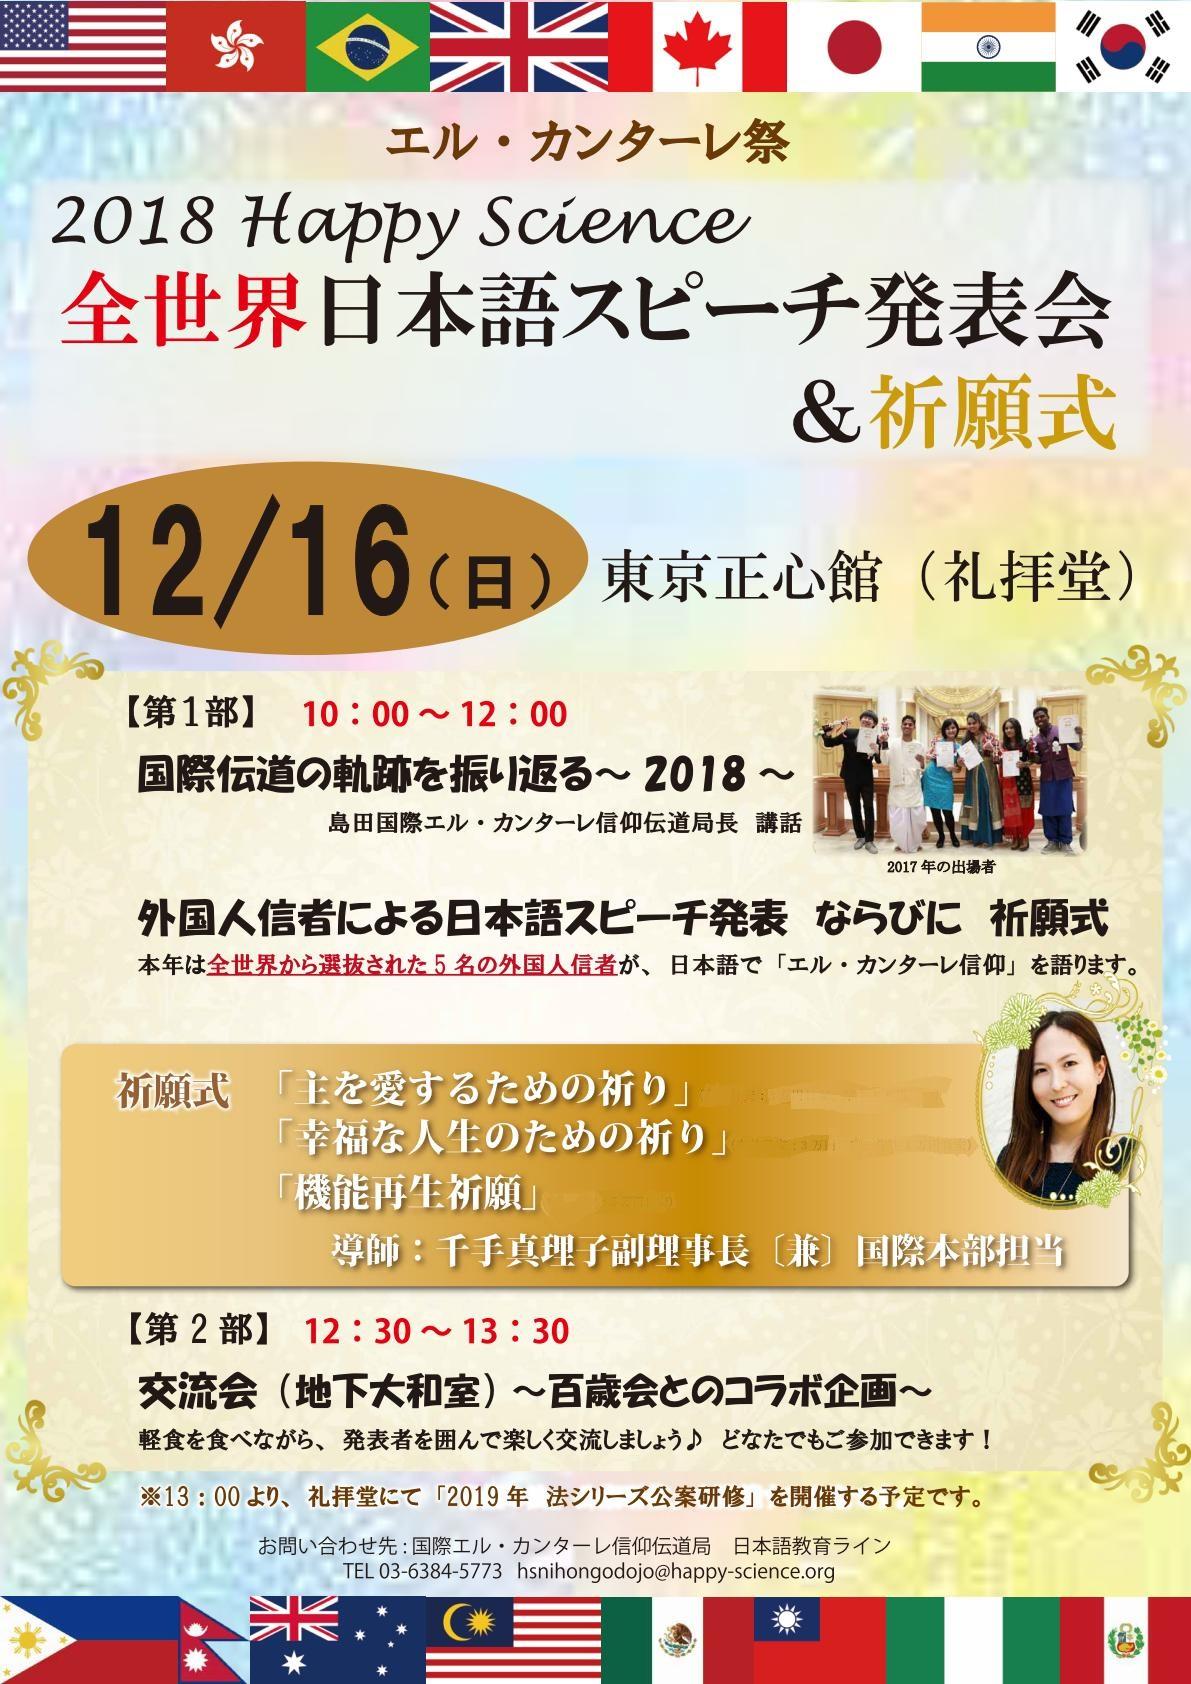 2018HS全世界日本語スピーチ発表会.pdf(送付用)_01